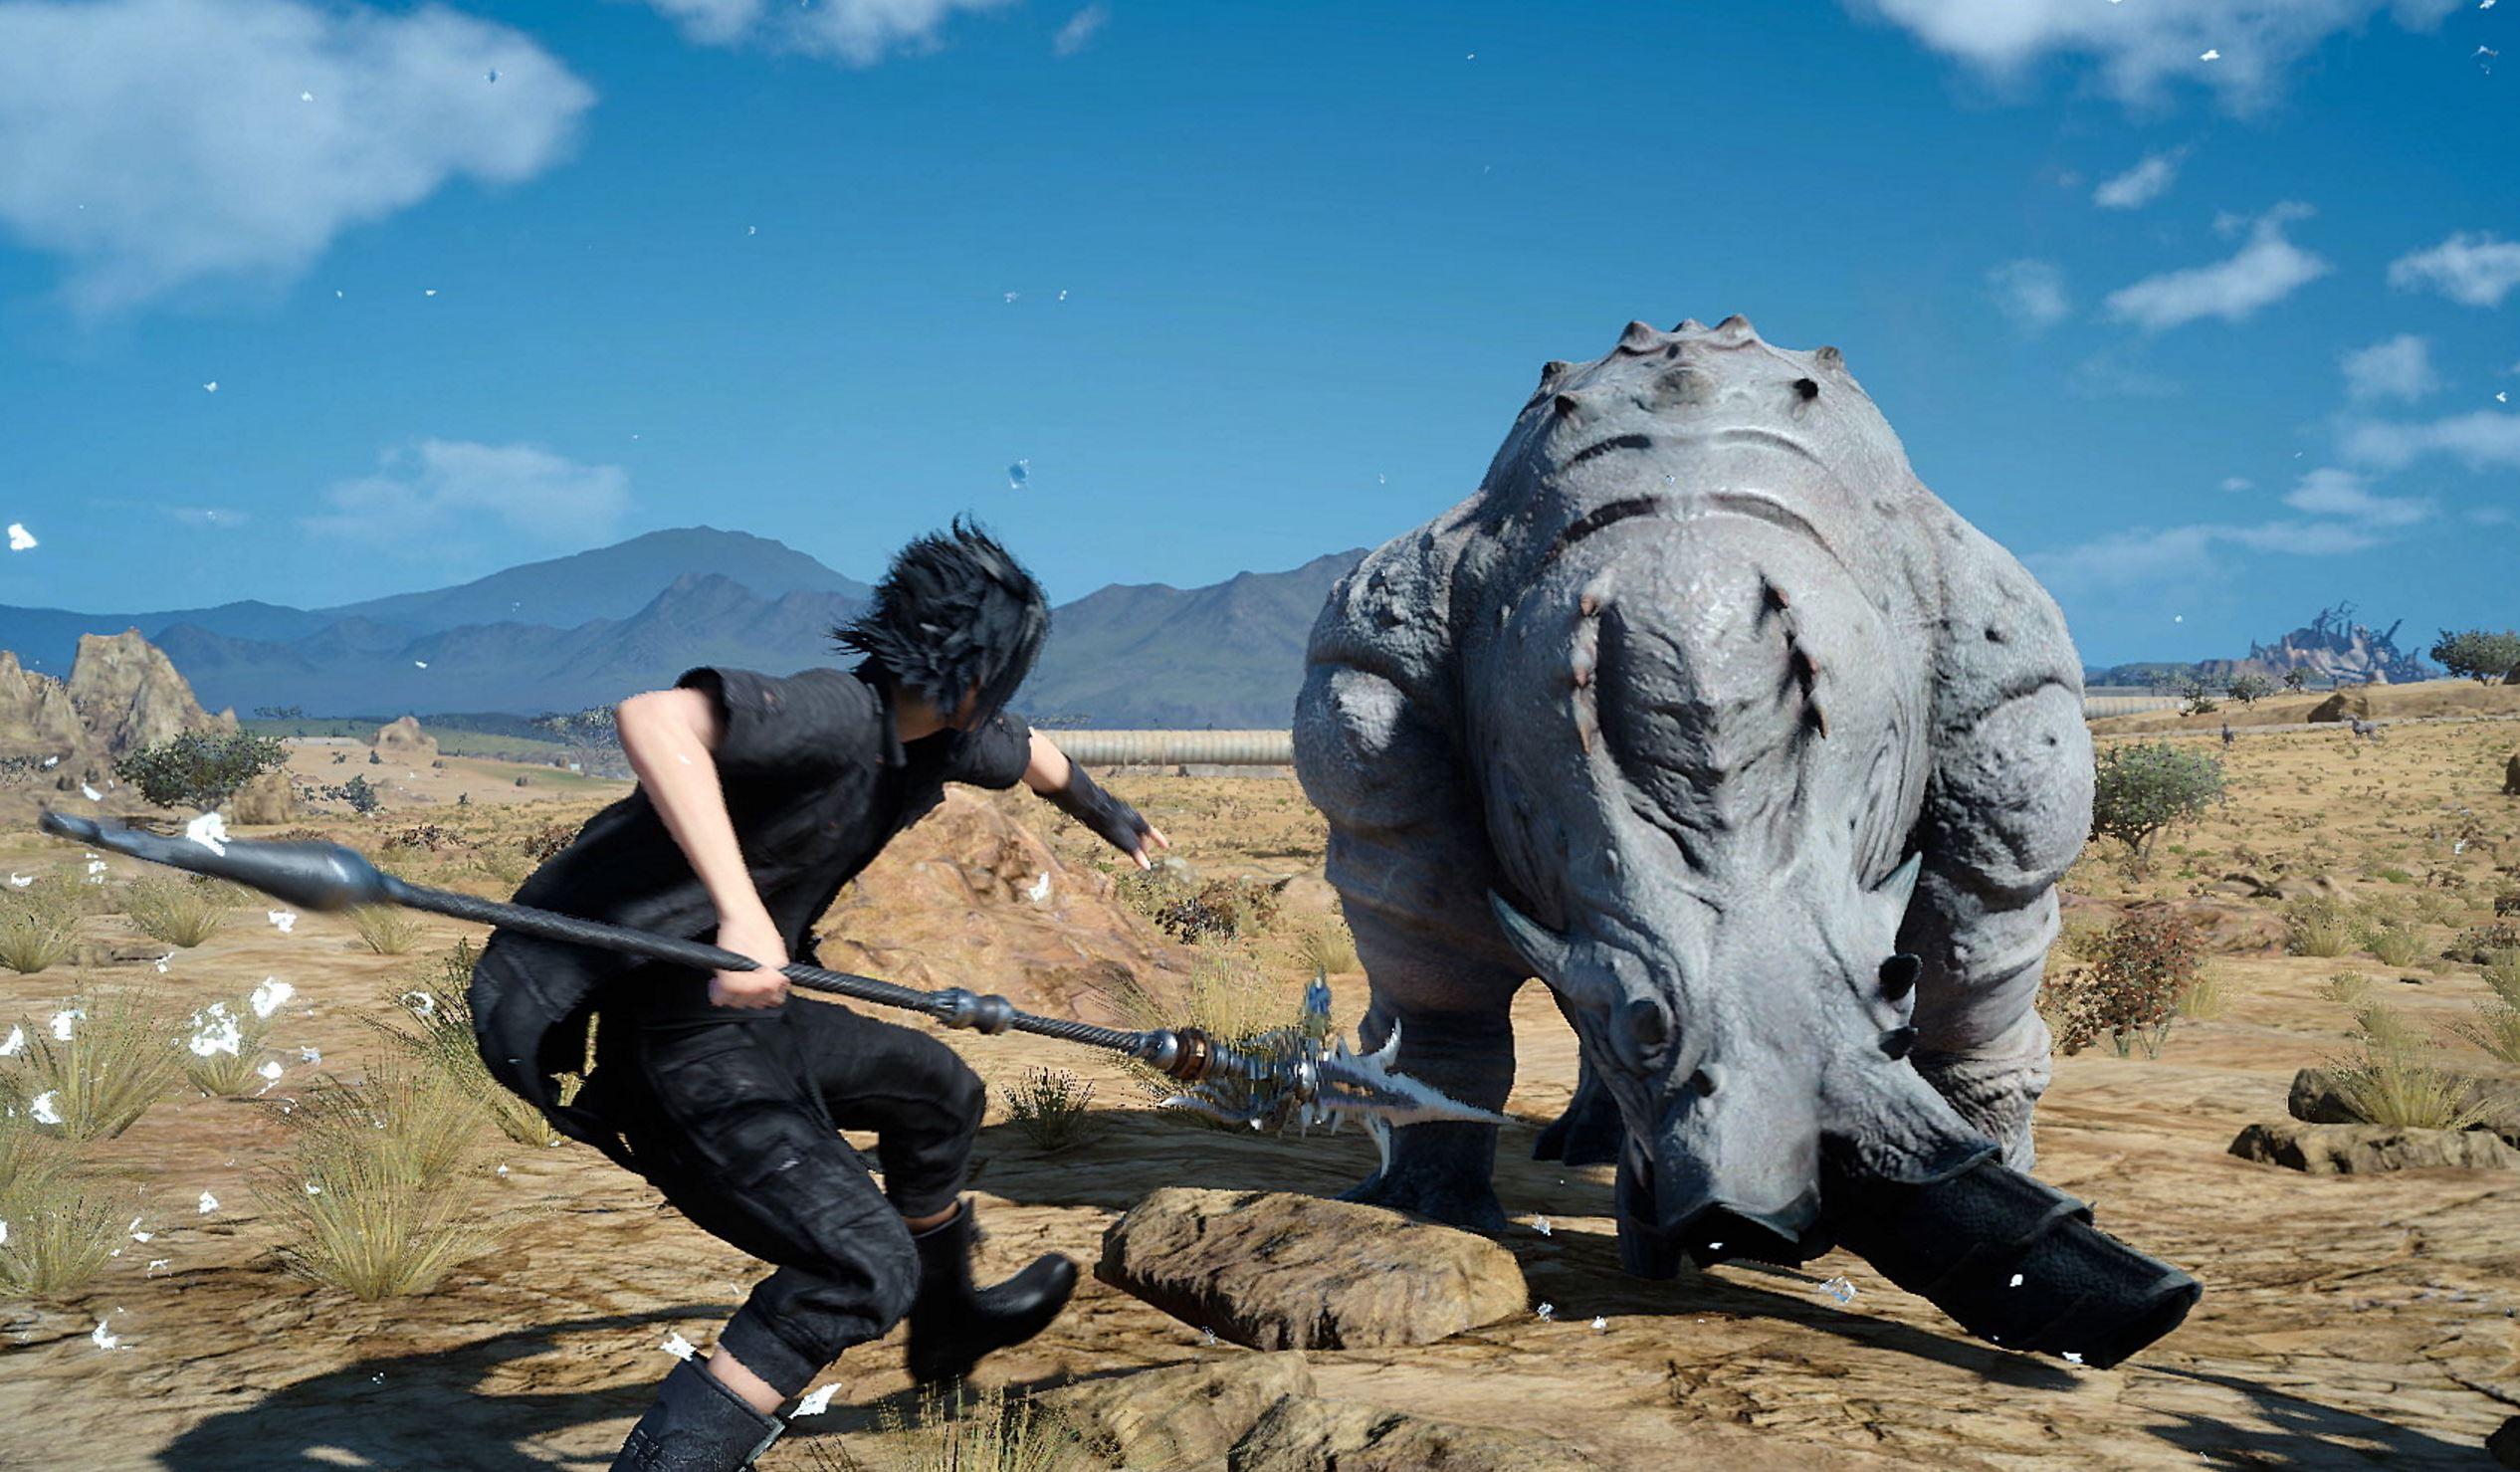 Final Fantasy XV: Podrás escoger 4K30fps o 1080p60fps en la